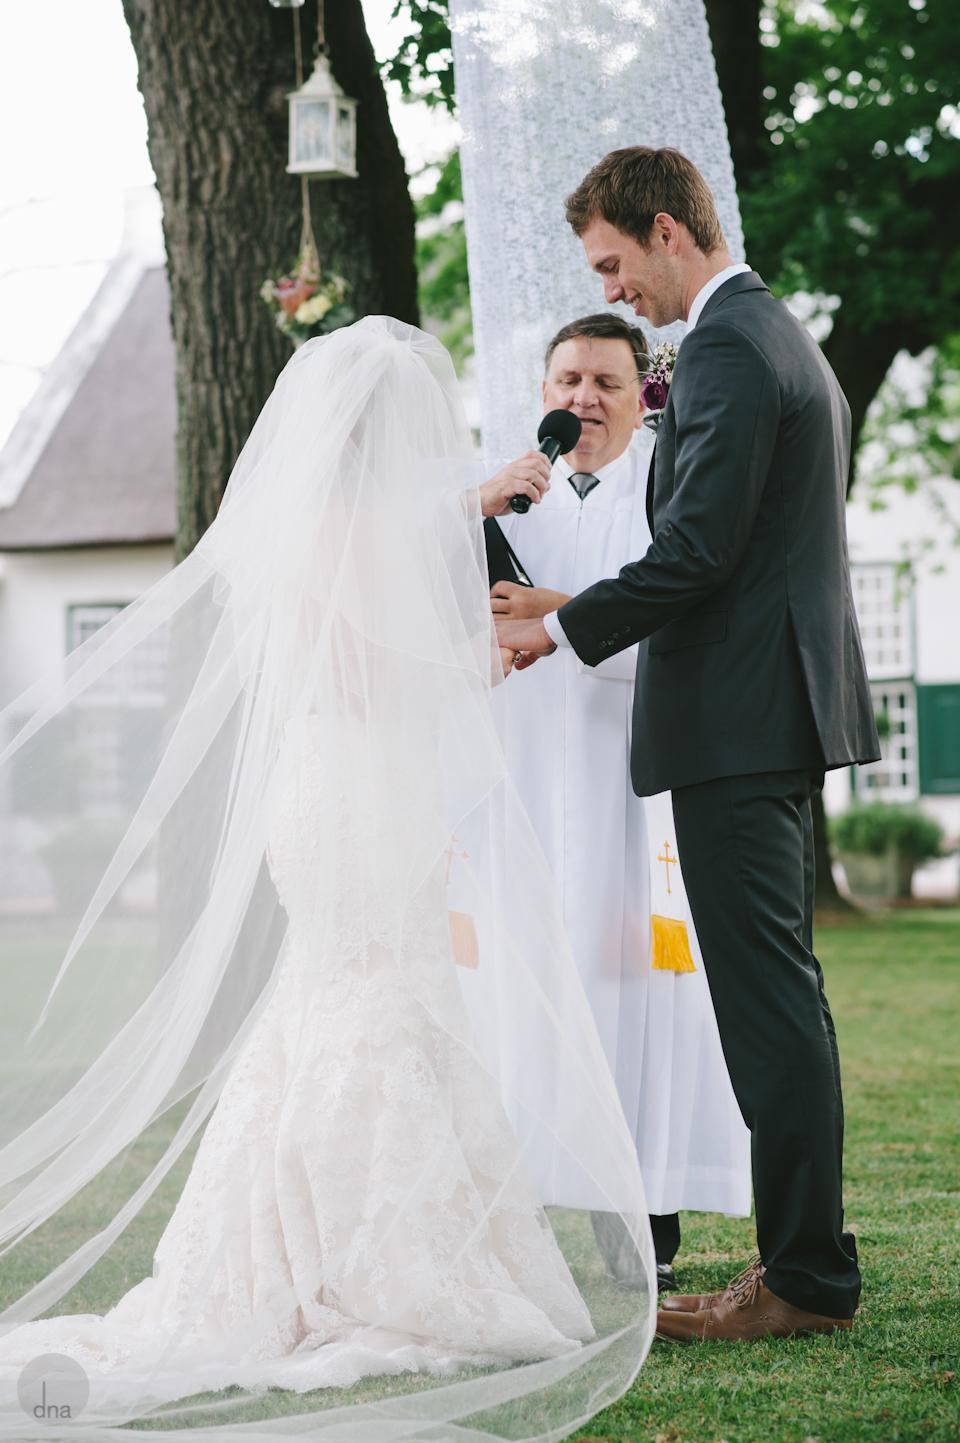 Amy and Marnus wedding Hawksmore House Stellenbosch South Africa shot by dna photographers_-541.jpg